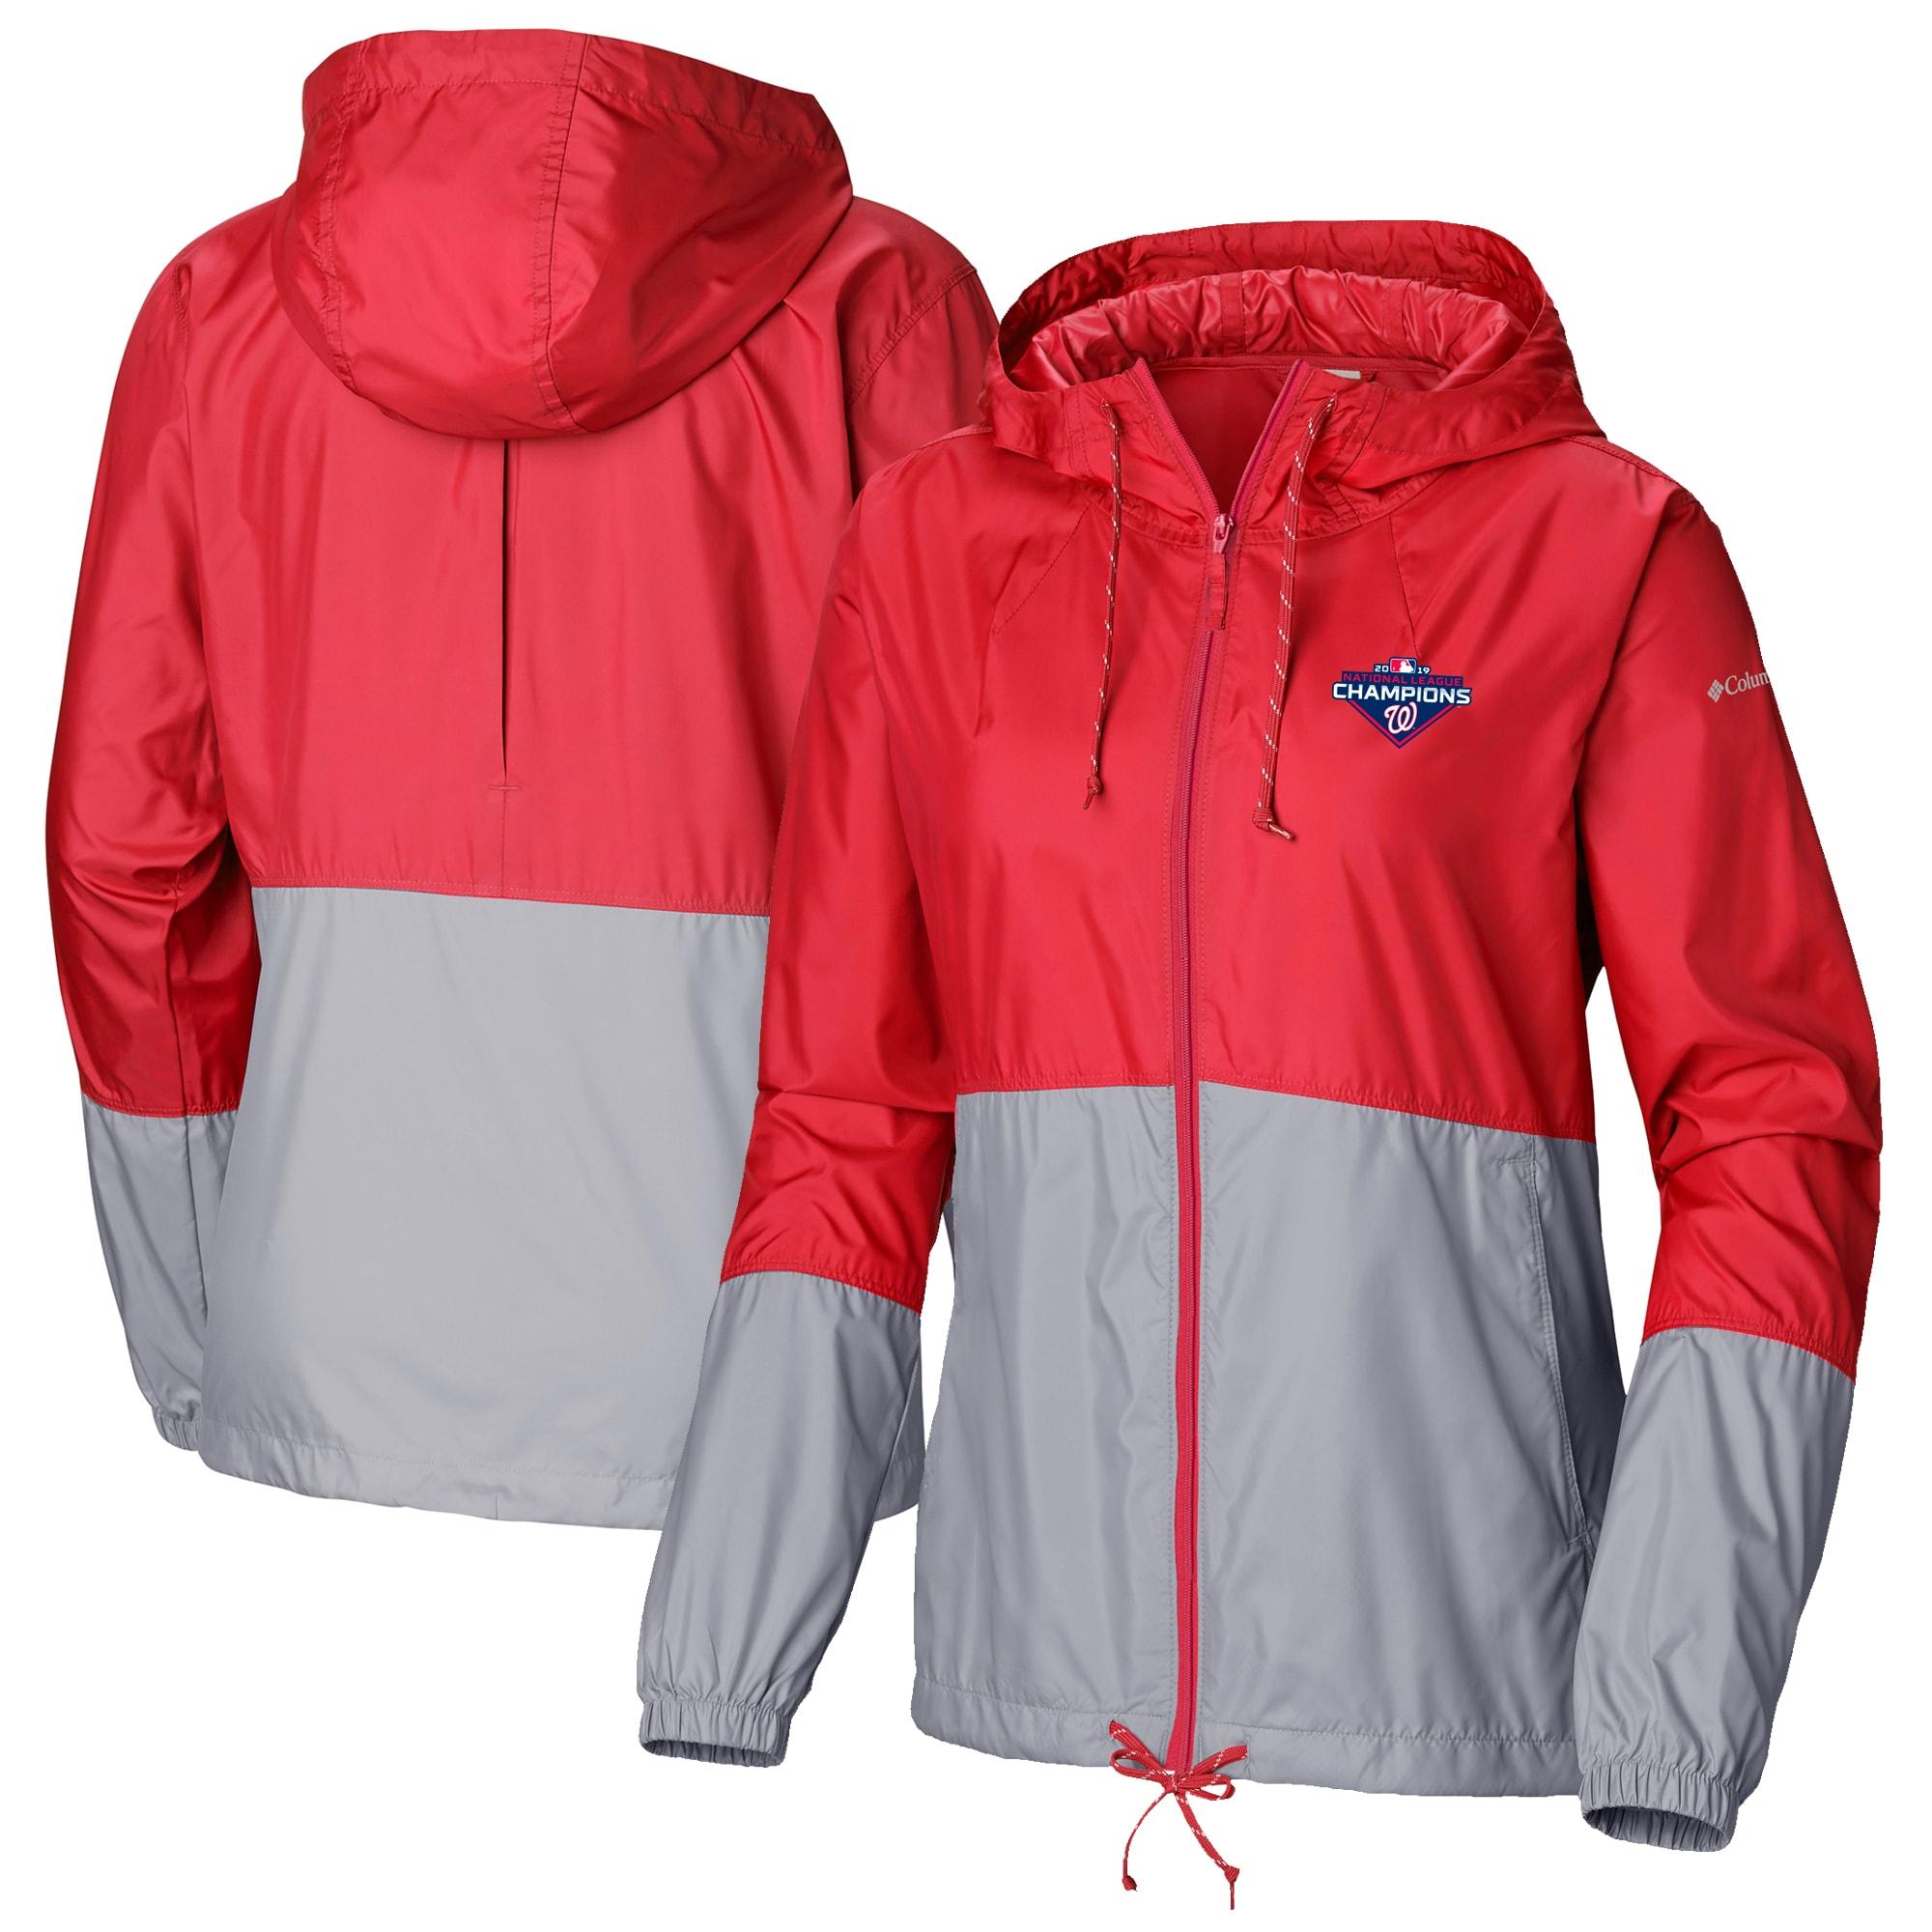 Washington Nationals Columbia Women's 2019 National League Champions Flash Forward Fill-Zip Windbreaker Jacket - Red